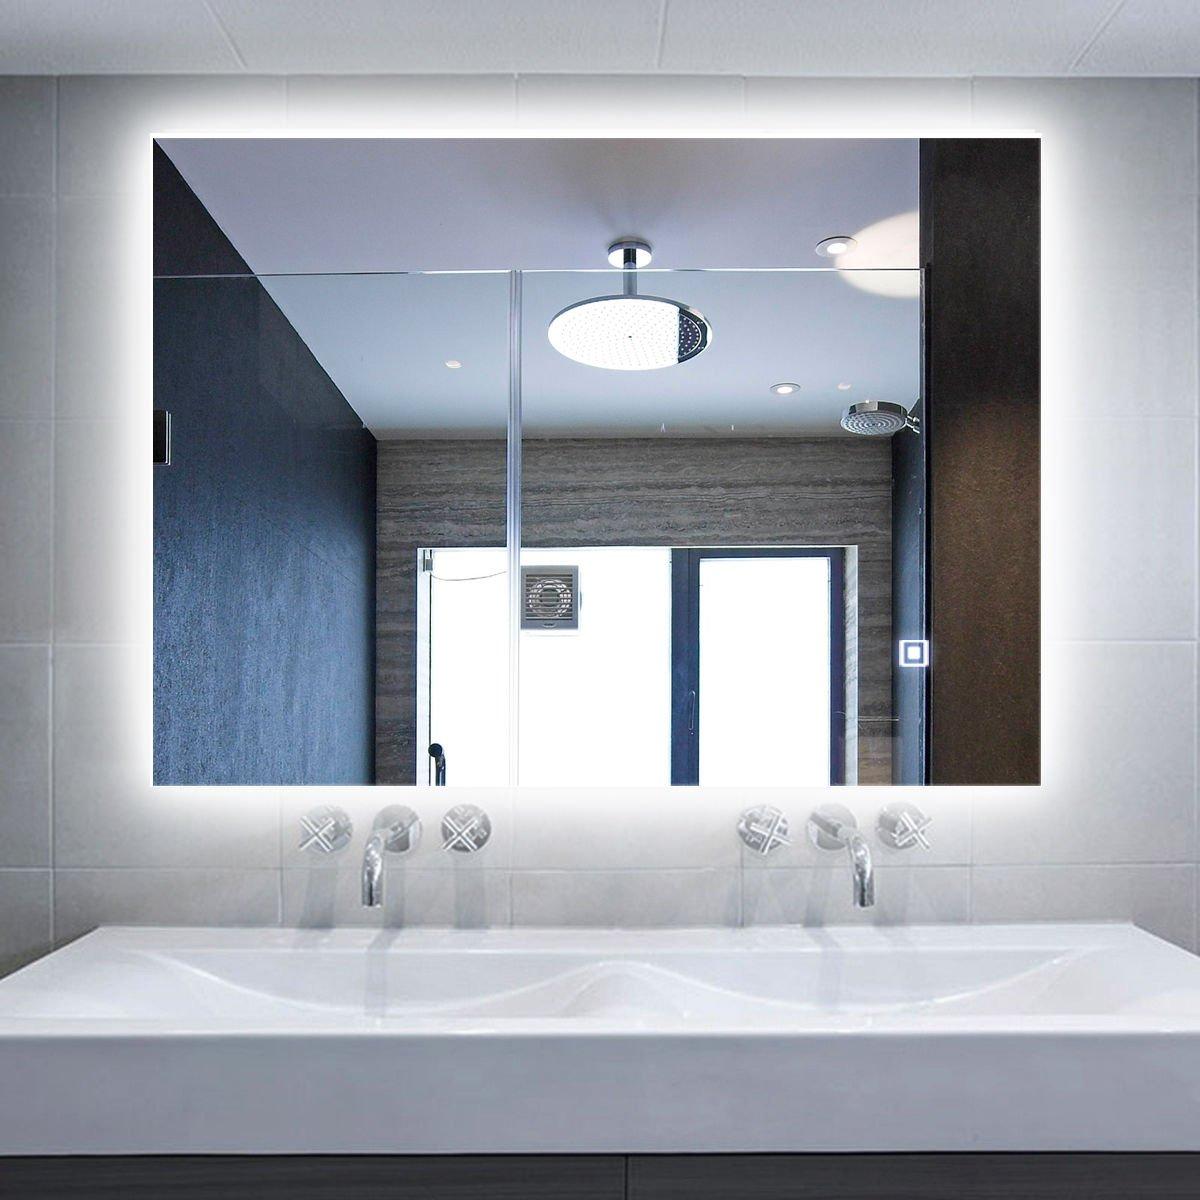 Holiday Bonus! Hans&Alice Brand New LED Wall Vanity Mirror Lighted Backlit Bathroom Silvered Mirror, 32''24''